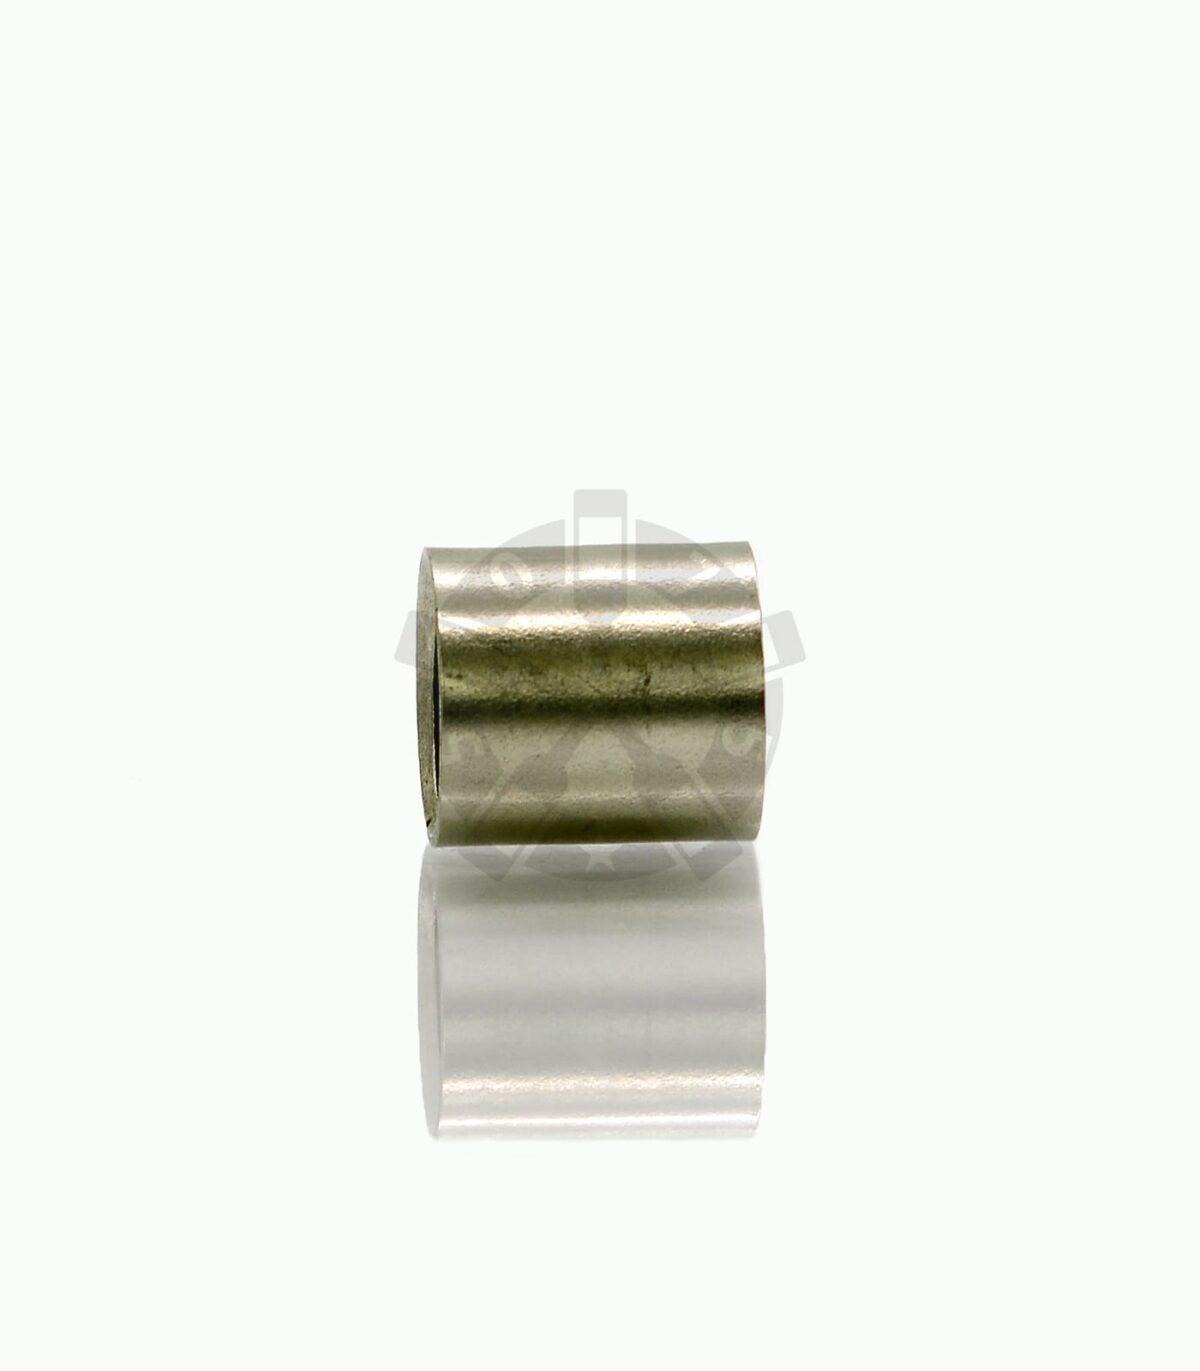 Муфта под кран, резьба 1/4, длина 30 мм (мама)